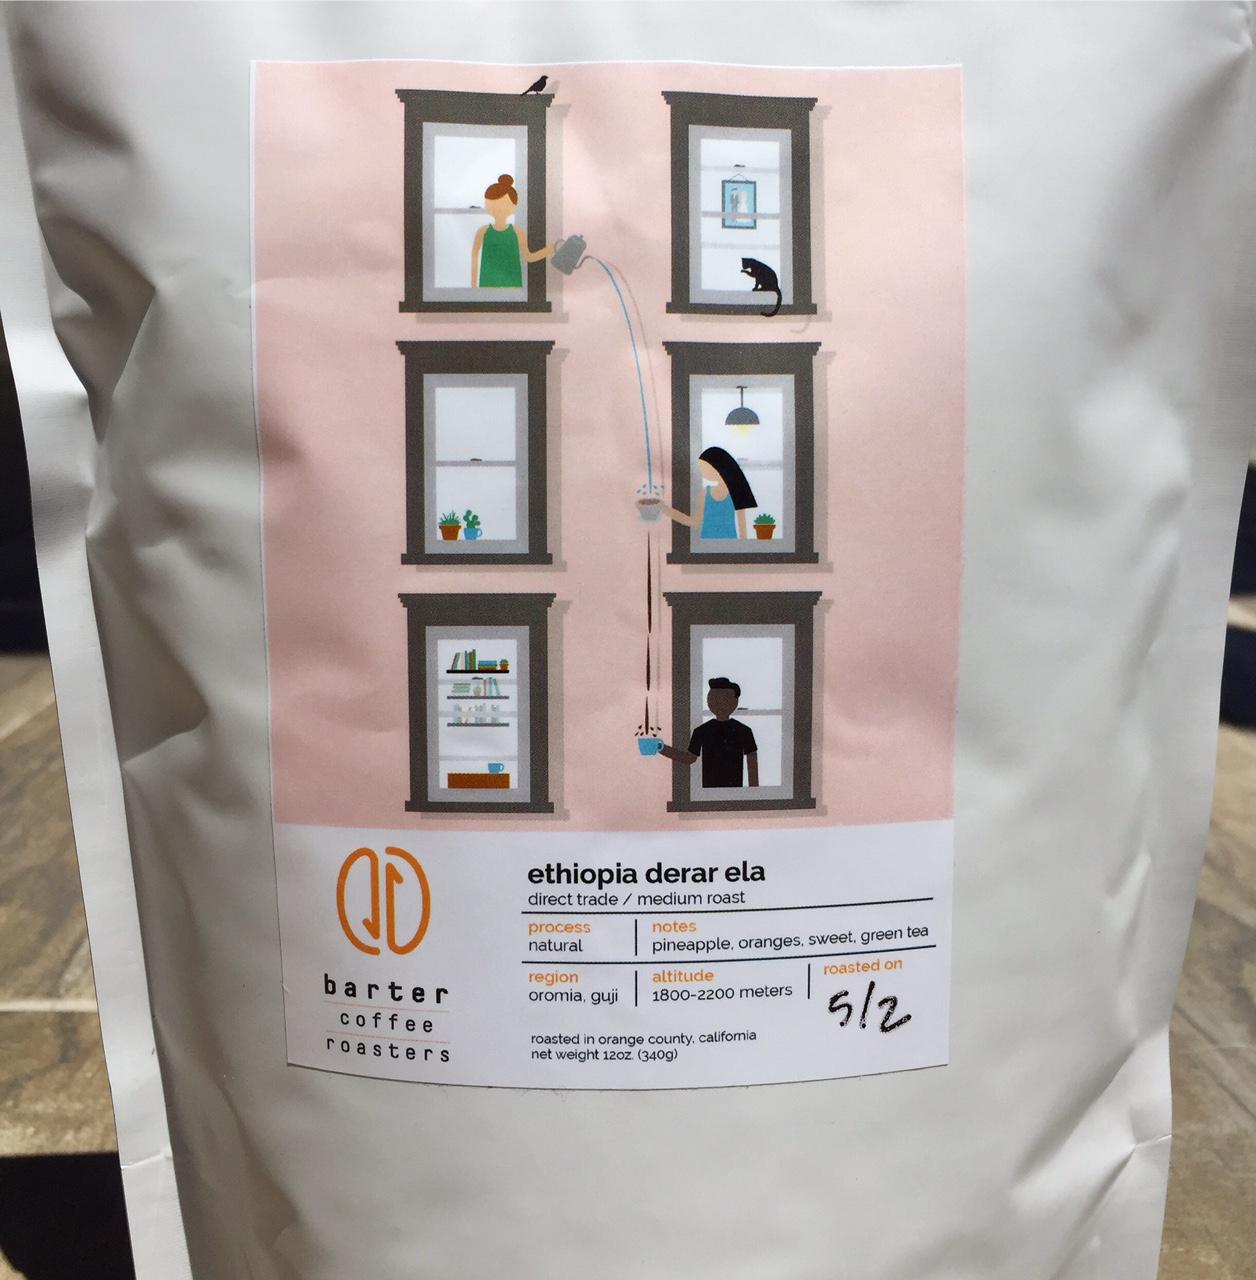 Barter Coffee Ethiopia Derar Ela